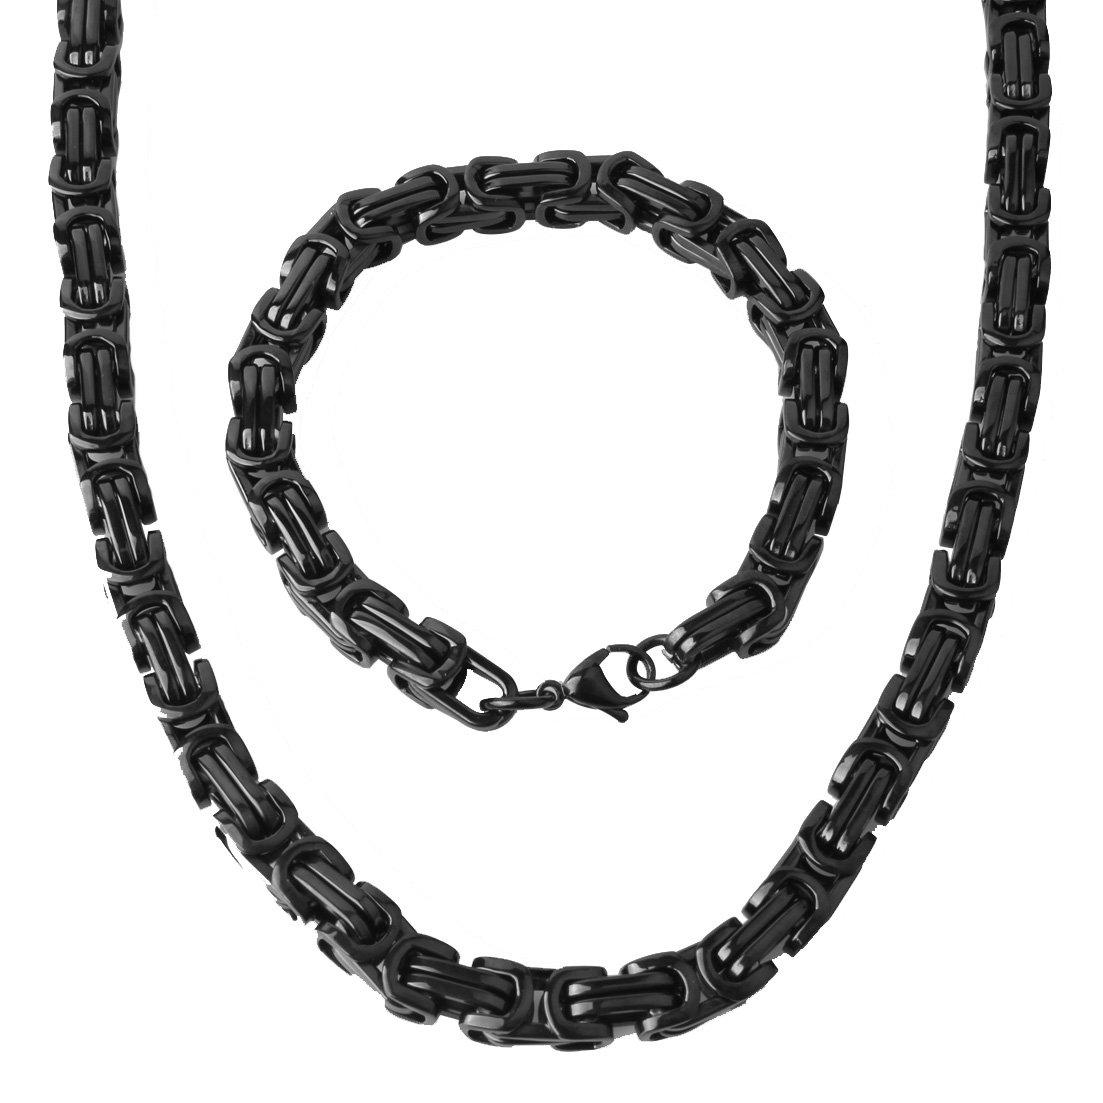 Mens Stainless Steel Mechanic Bracelet Necklace Link Byzantine Chain Set Black color